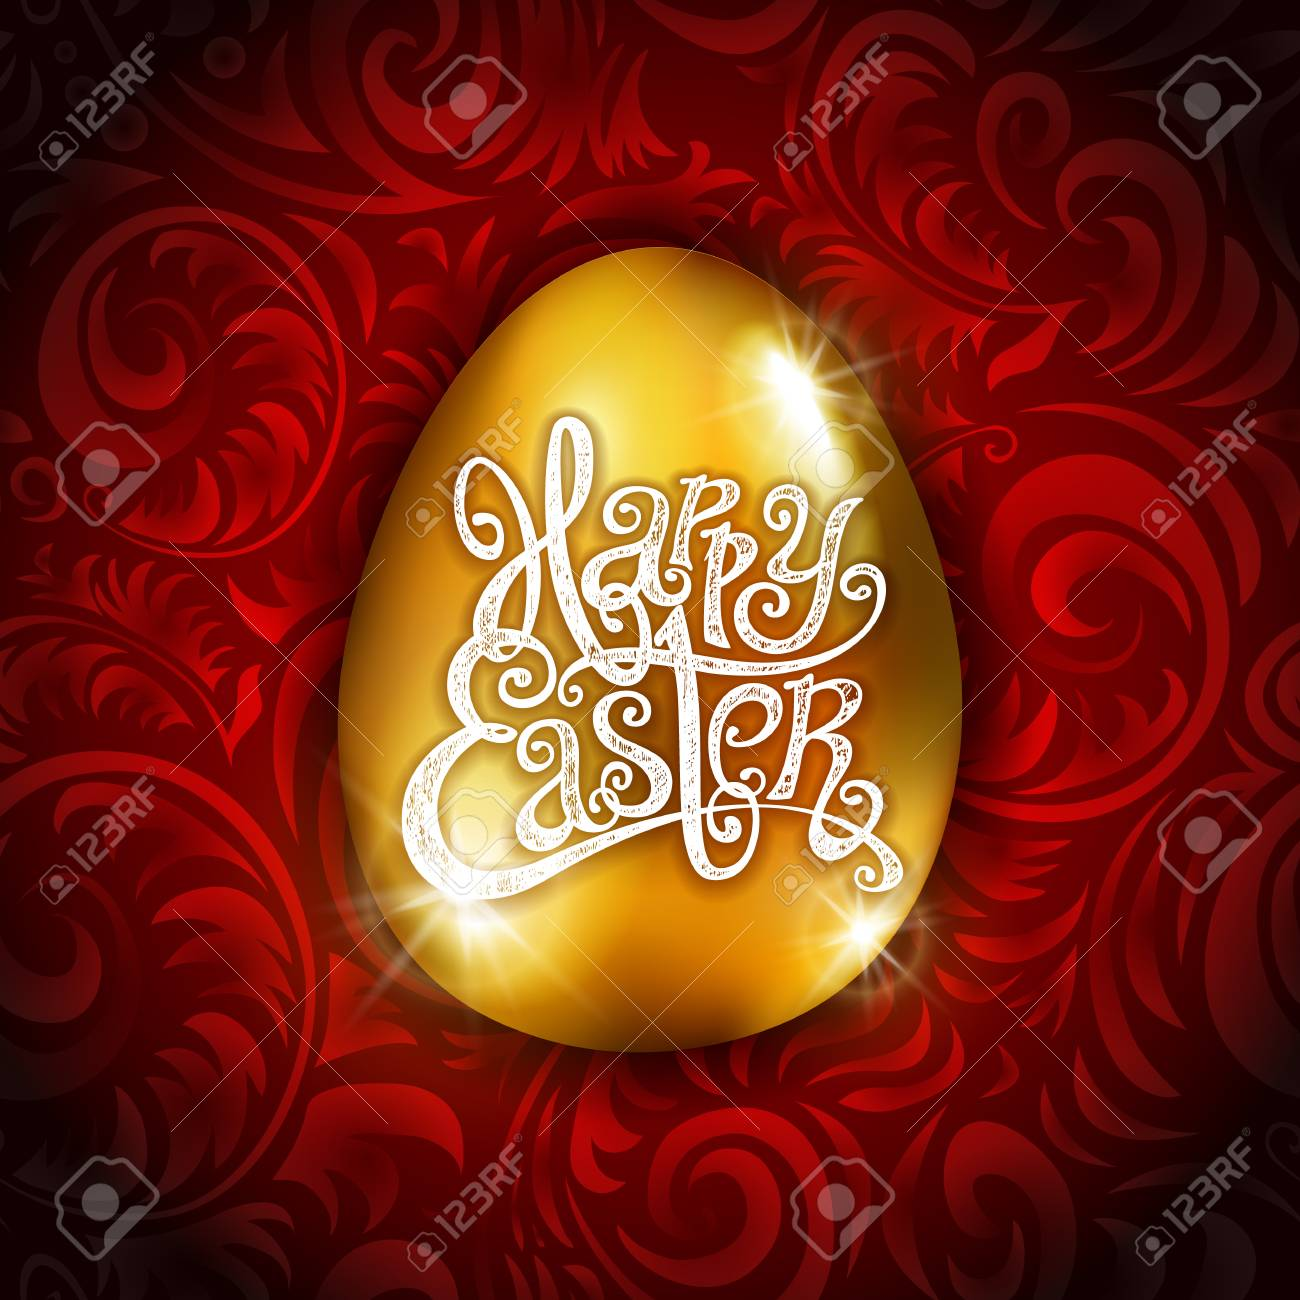 Vector Gold Foil Happy Easter Greeting Golden Egg Card Red